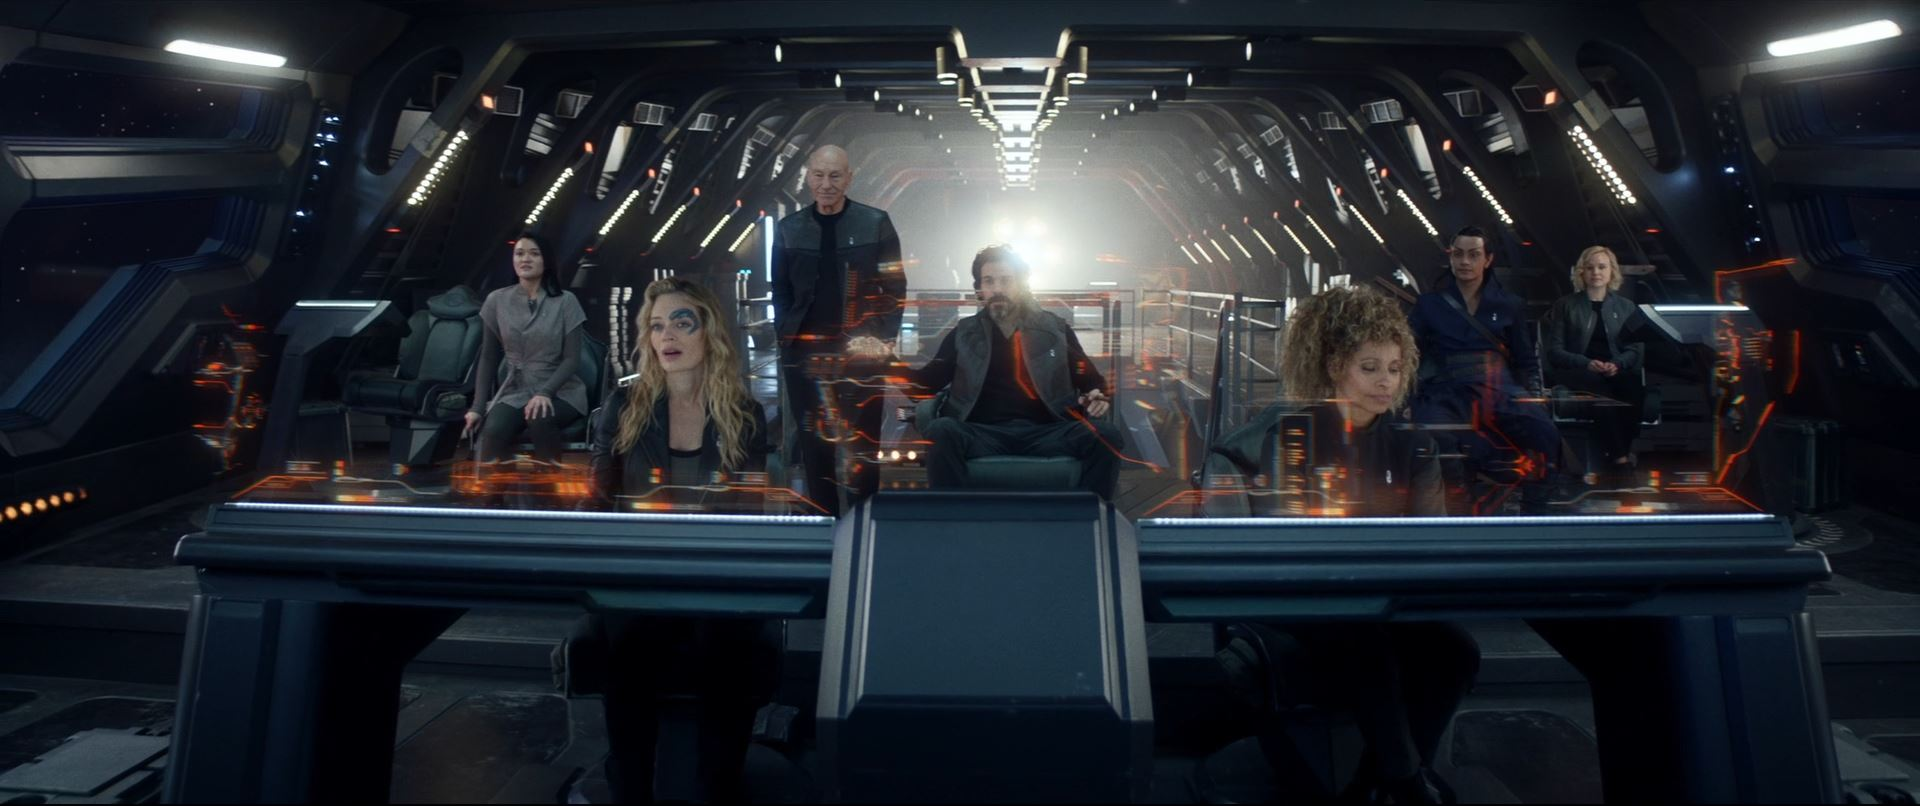 Star Trek Picard S01E10 Et in Arcadia Ego Part 2 Review - The new crew of La Sirena